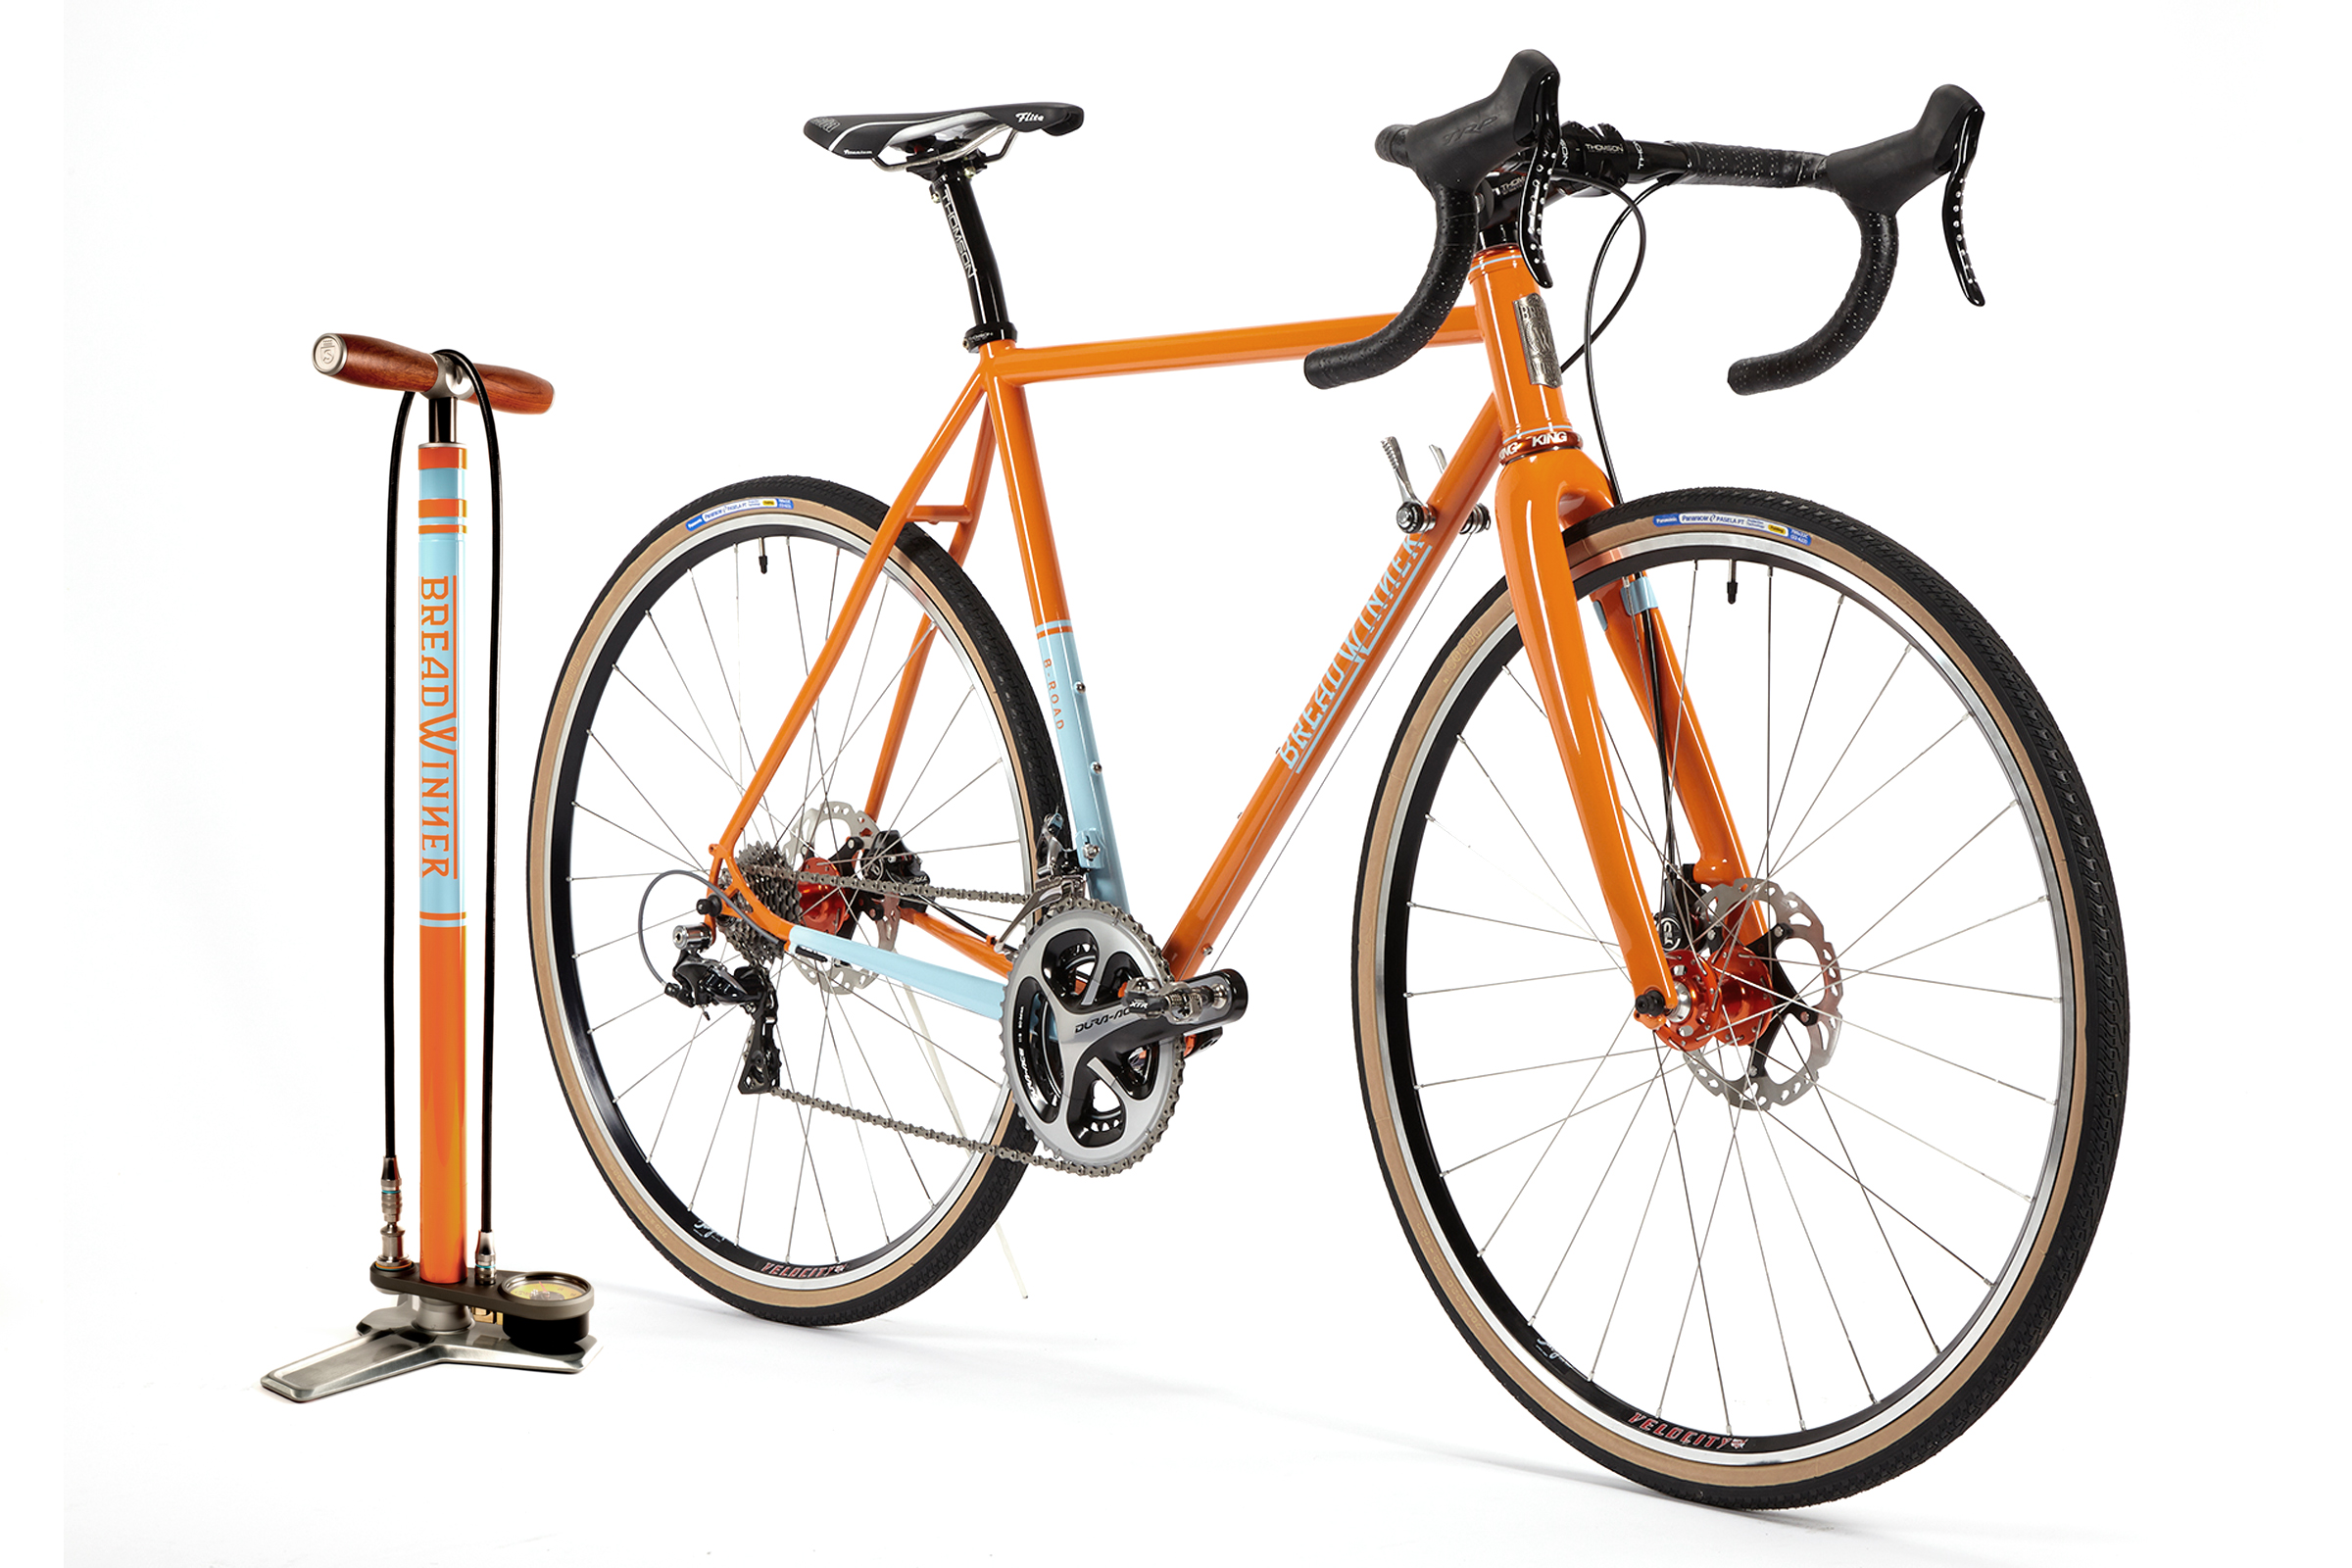 SILCA Super Pista Ultimate Floor Pump – Breadwinner Cycles